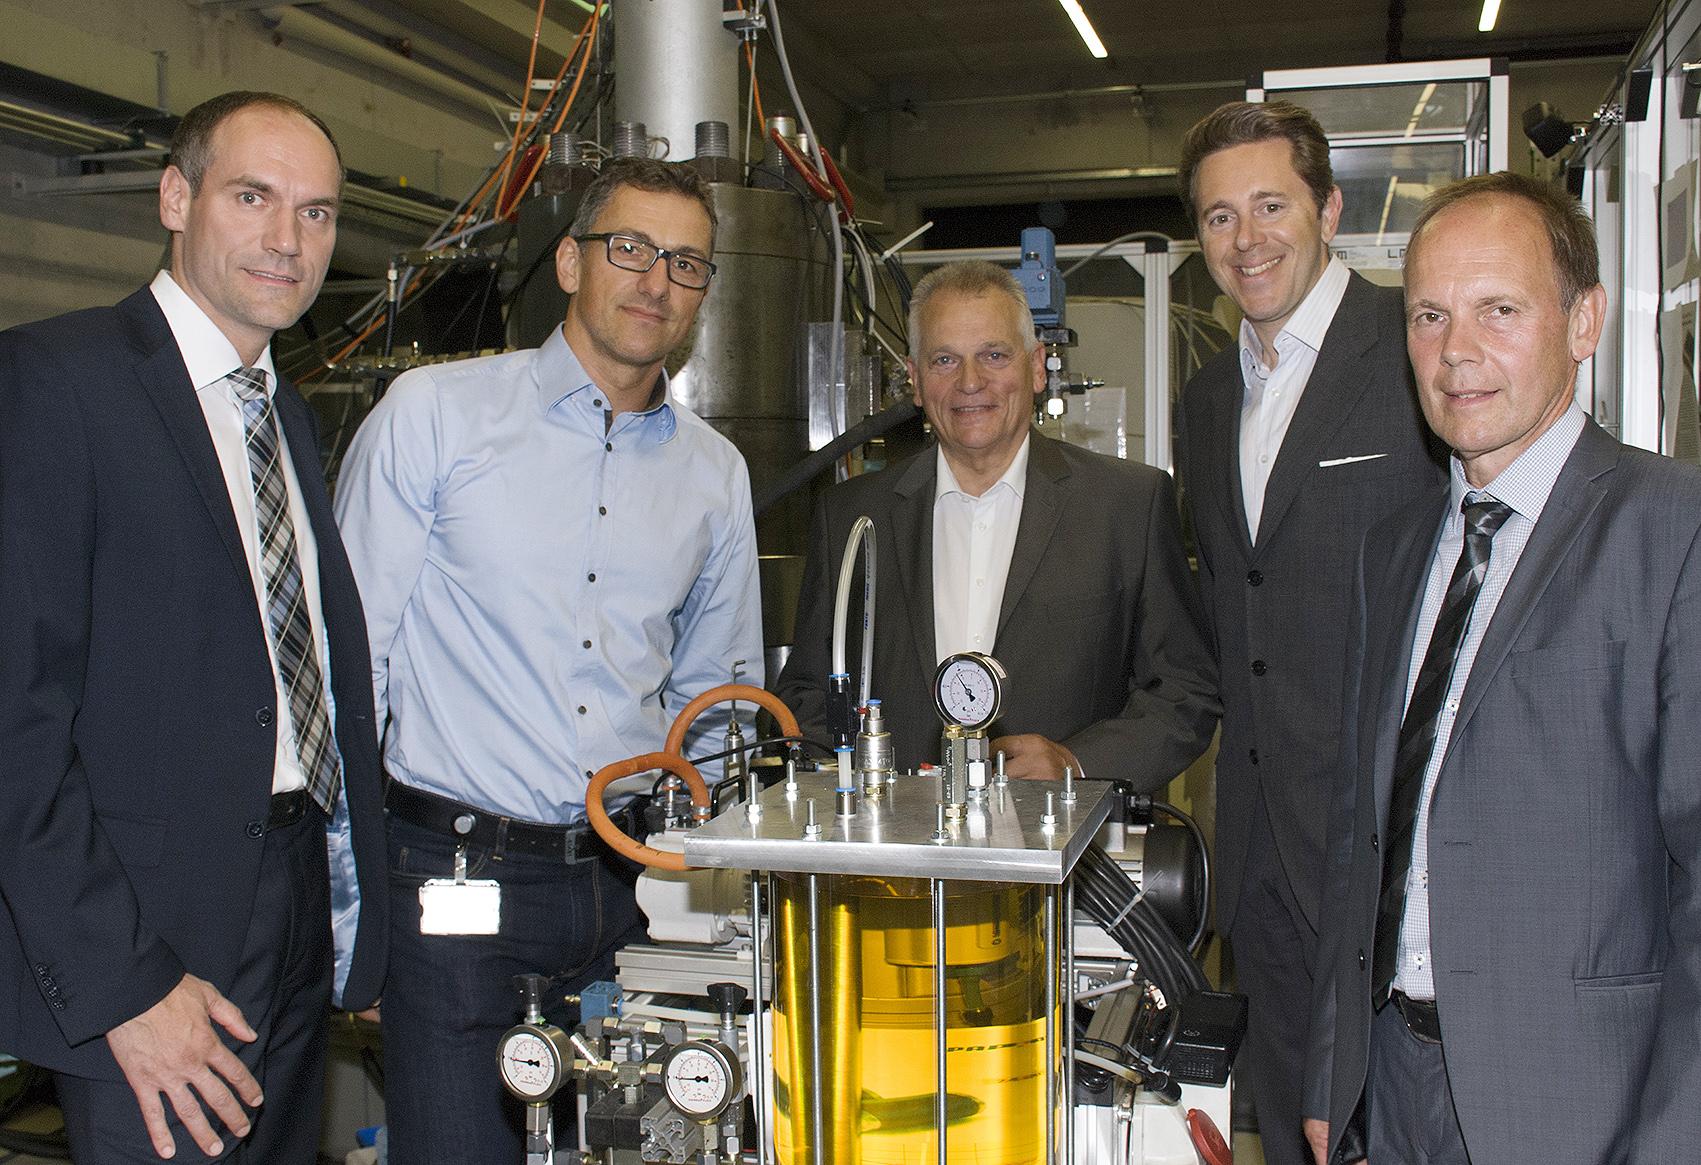 Staatssekretär Dr. Harald Mahrer besucht LCM